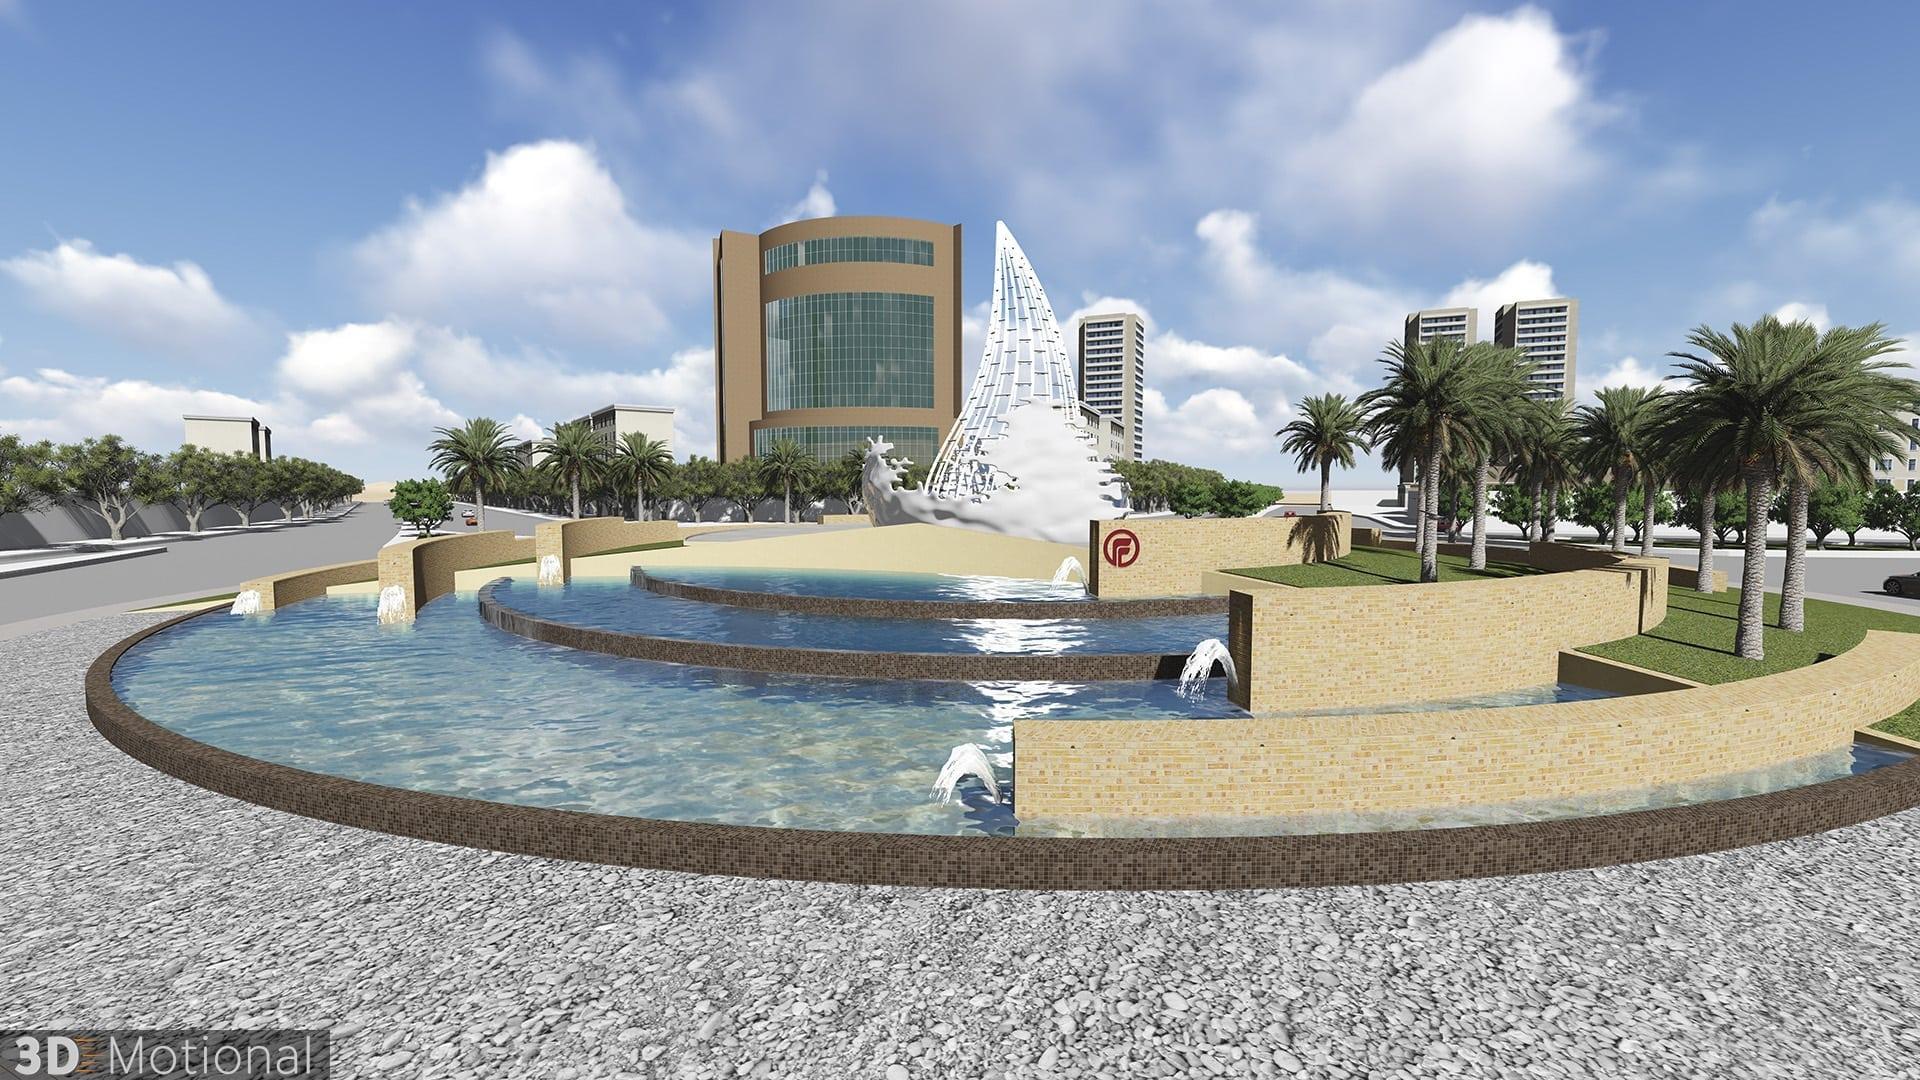 Al Fozan-Roundabout-khobar (3)